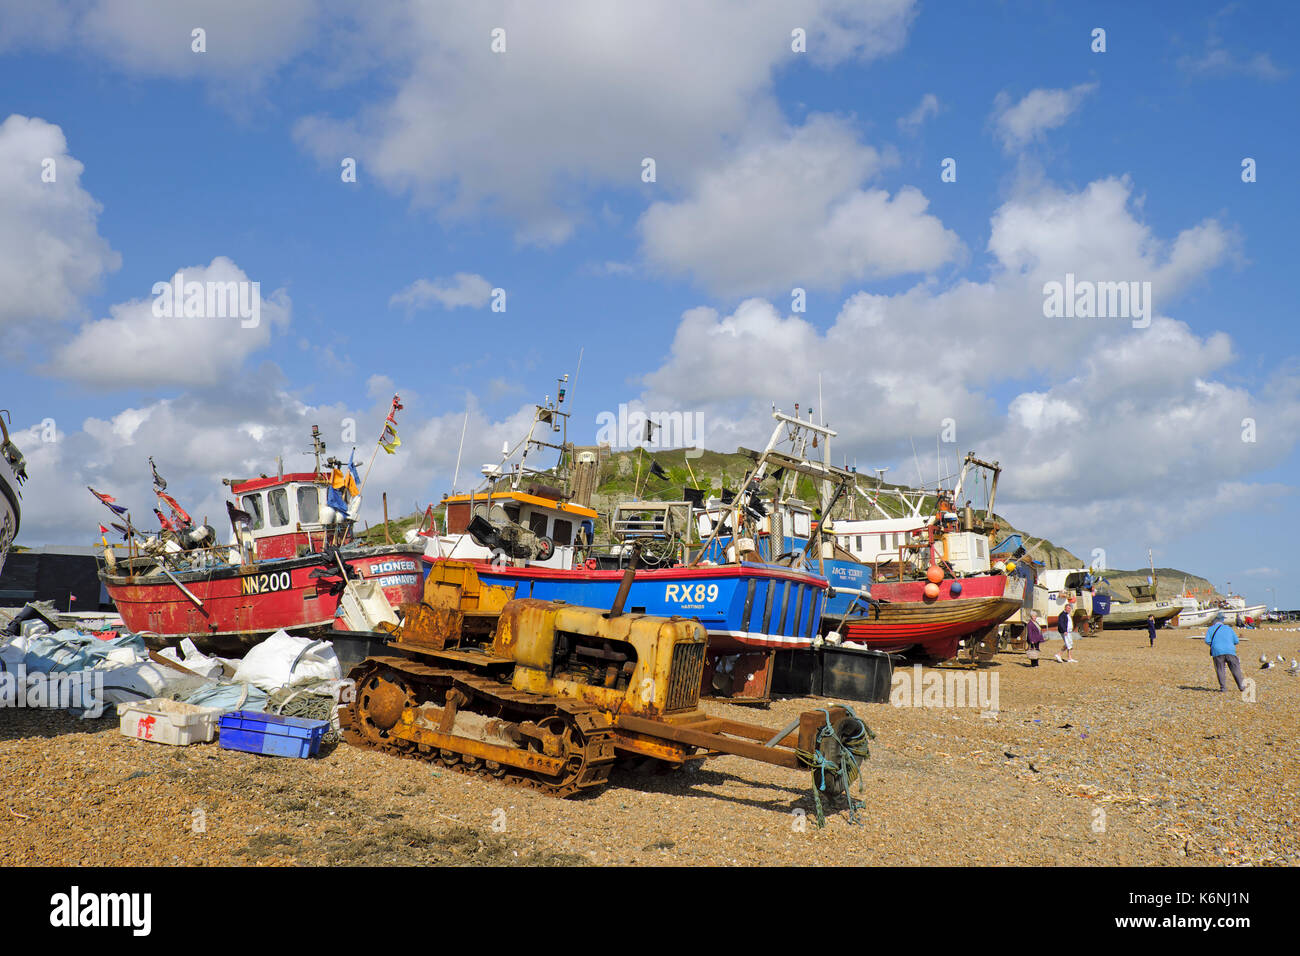 Stade Fischerboot am Strand von Hastings, East Sussex, UK, GB Stockbild